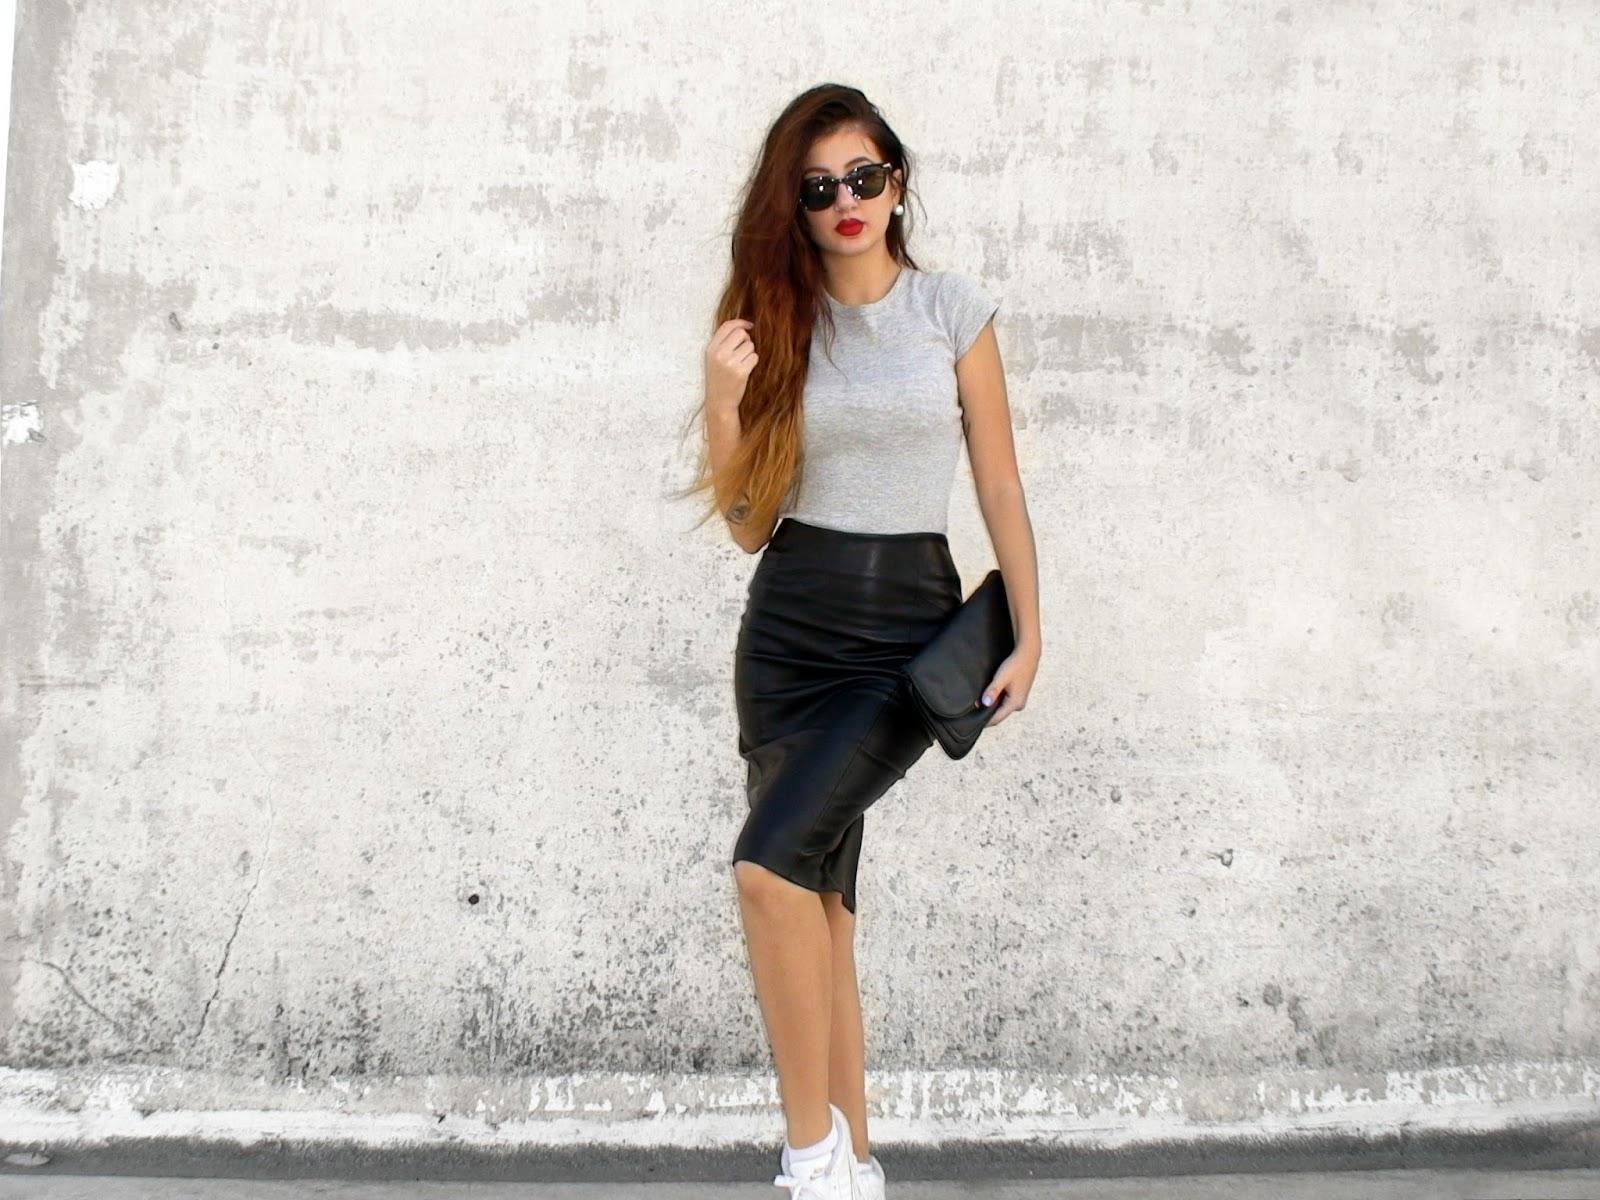 black skirt outfits tumblr